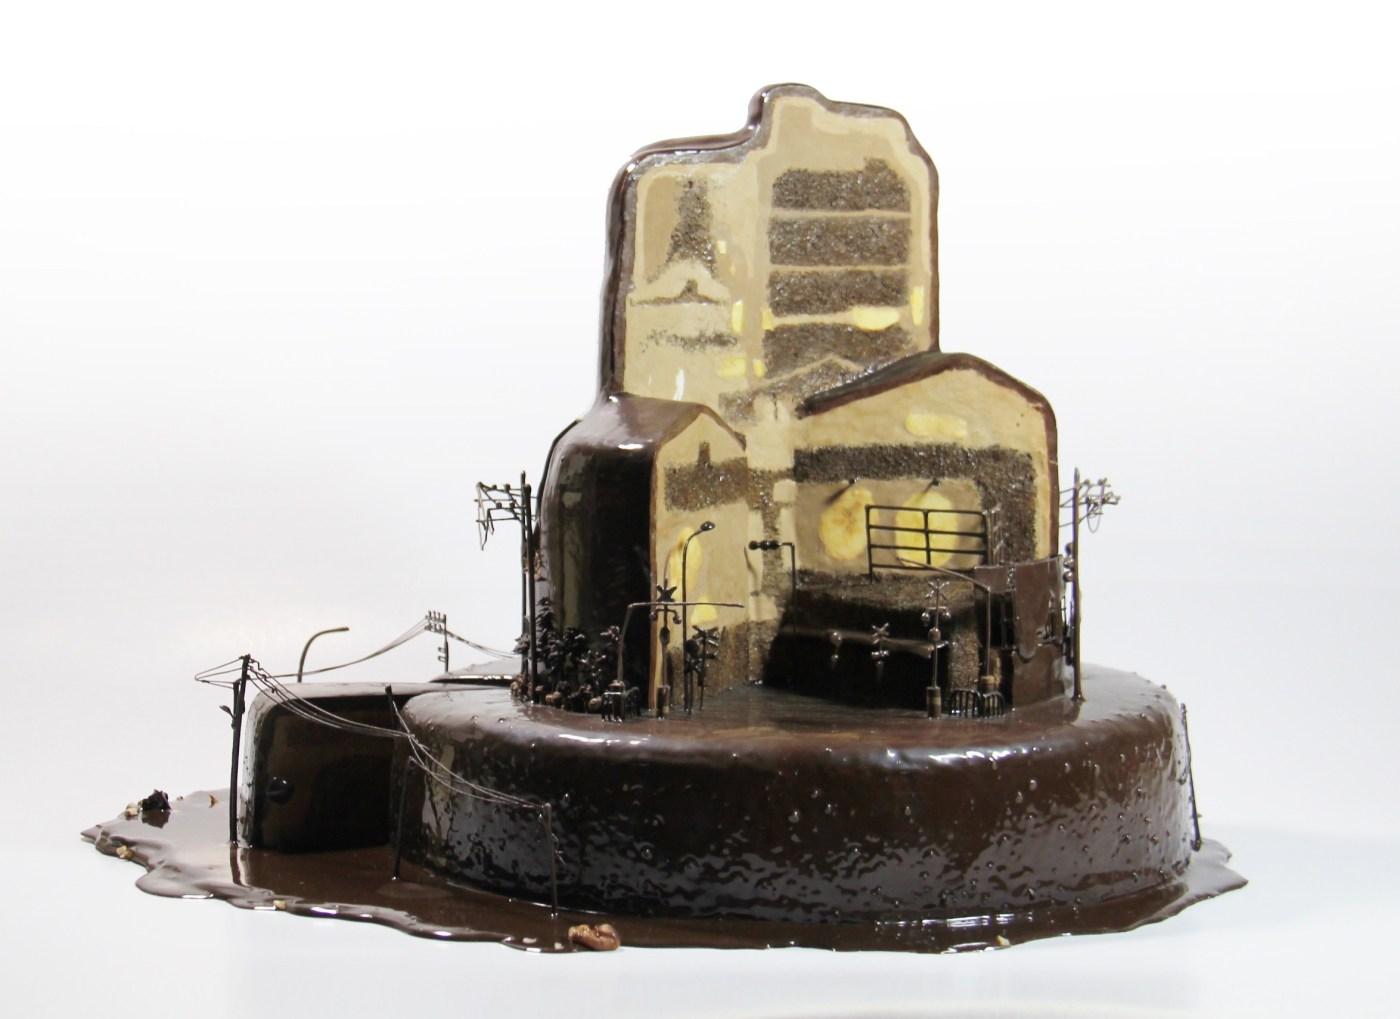 林玉婷 Lin Yu-Ting, 鐵道_三層蛋糕 Along the Railraod_Three Layer Cake.jpg -2.jpg